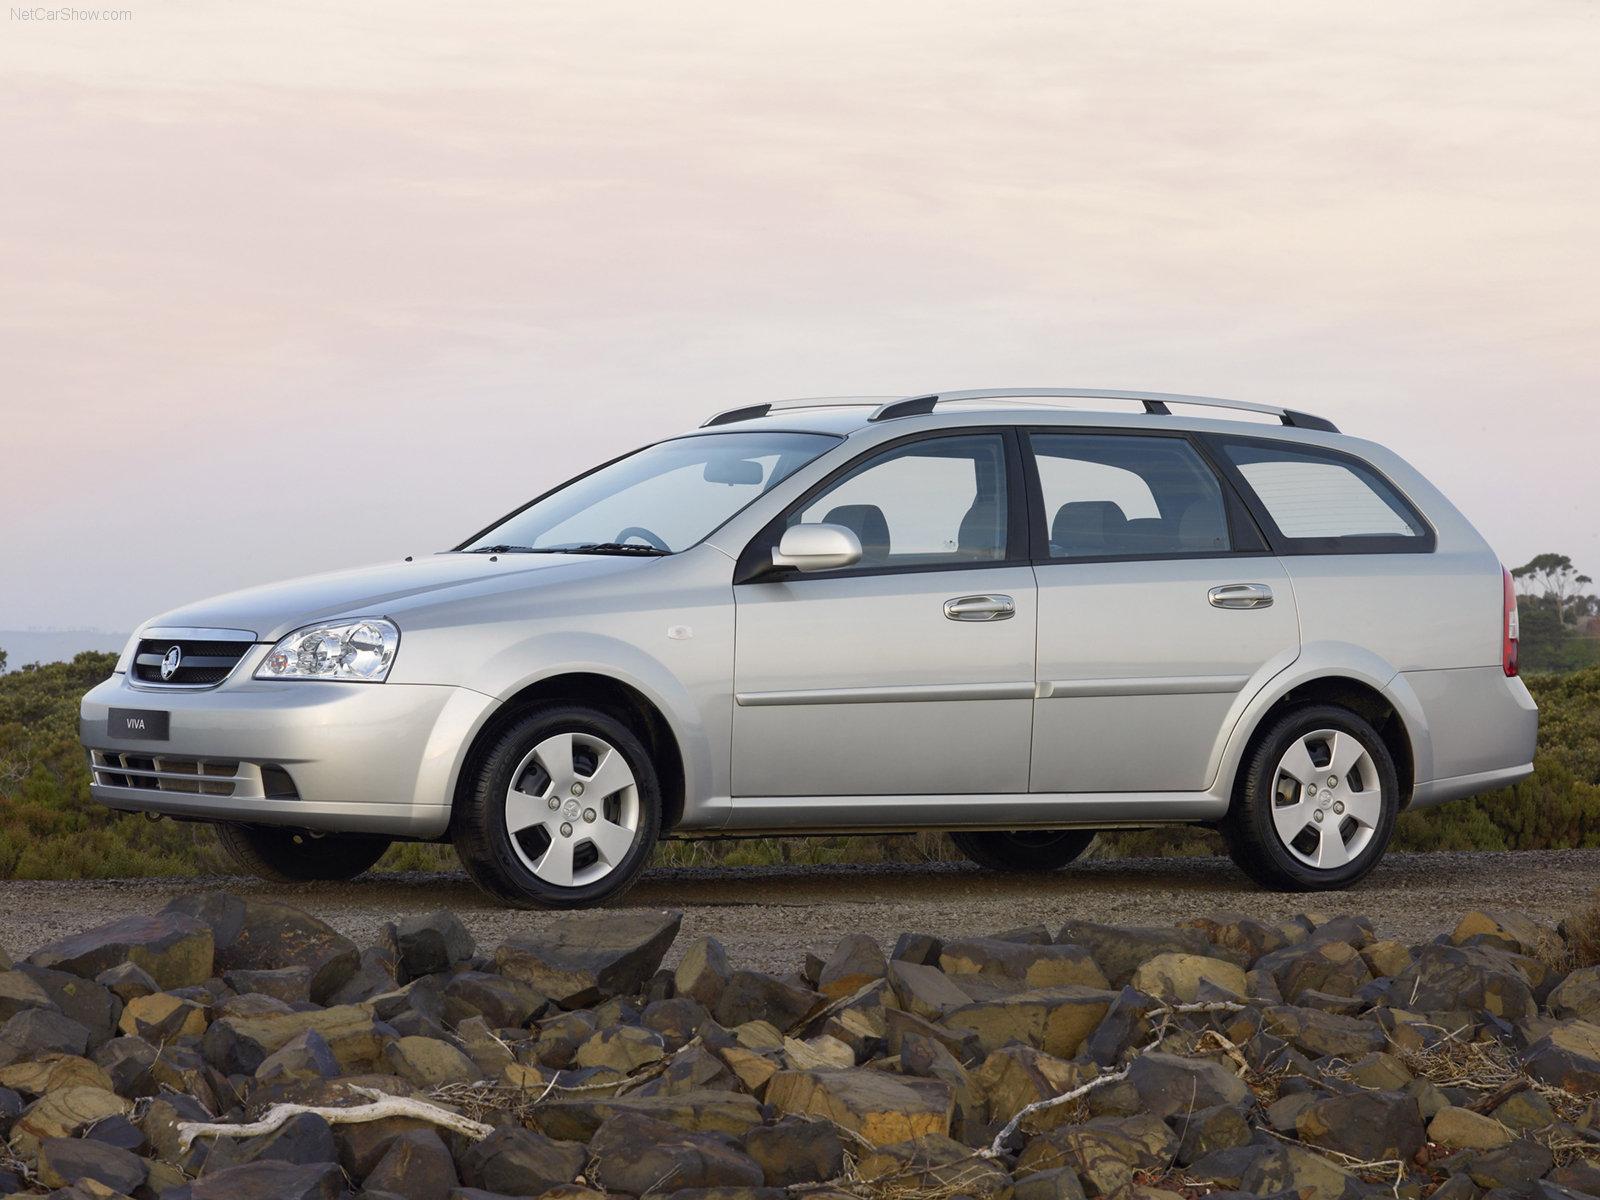 Holden JF Viva Wagon photos  PhotoGallery with 7 pics CarsBasecom